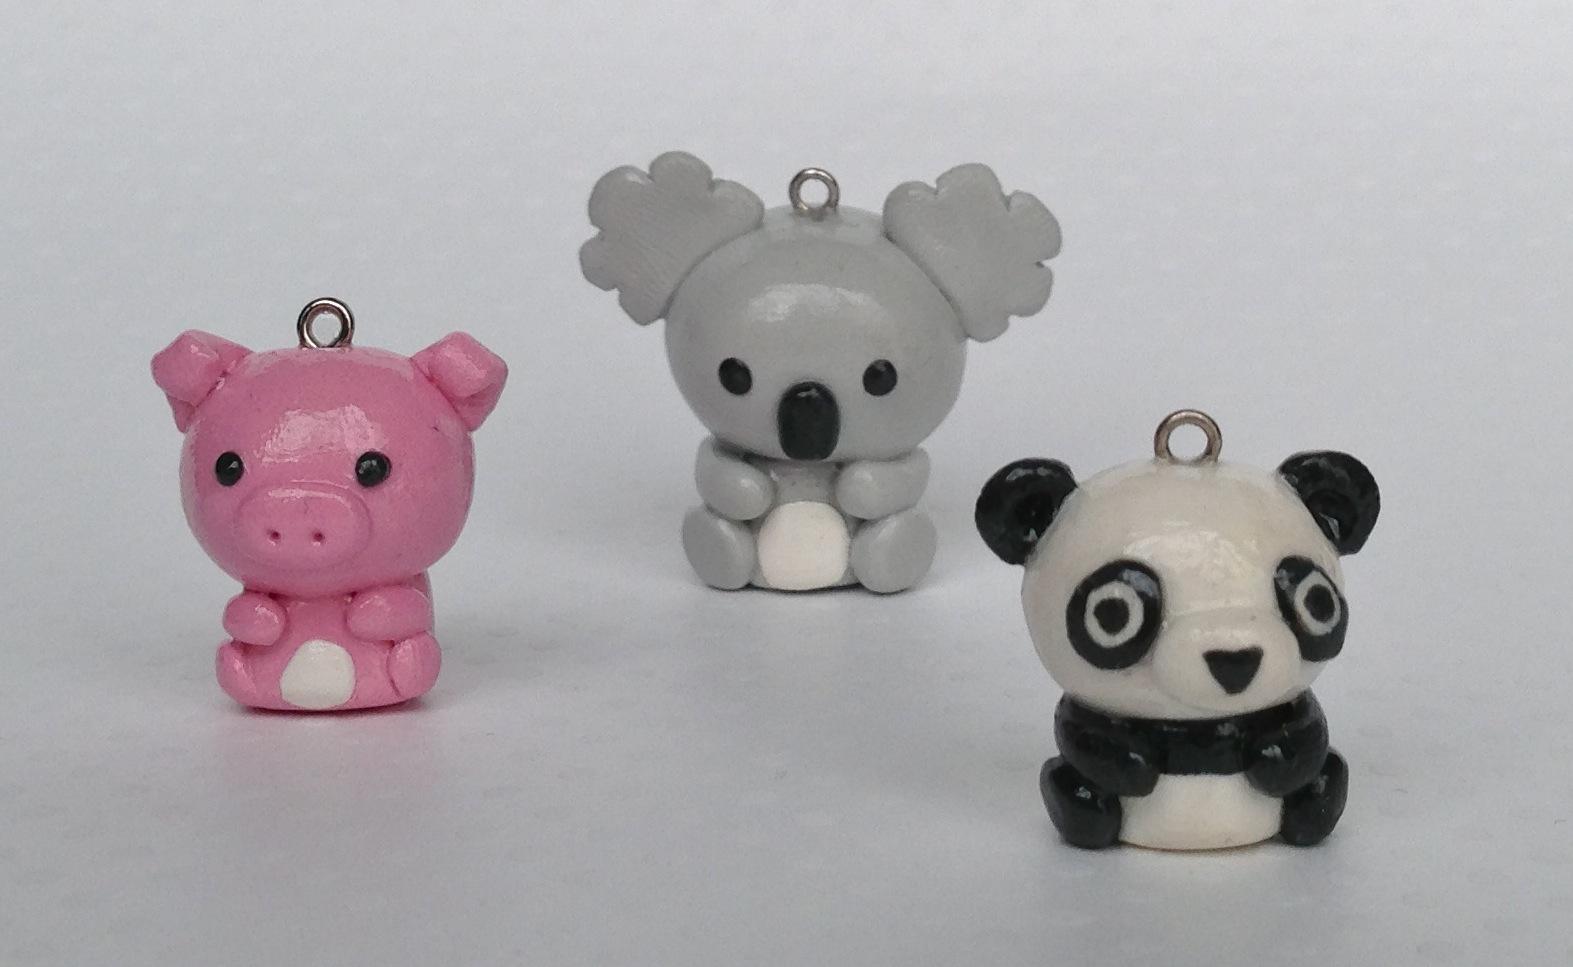 Cute Polymer Clay Animals | Car Interior Design